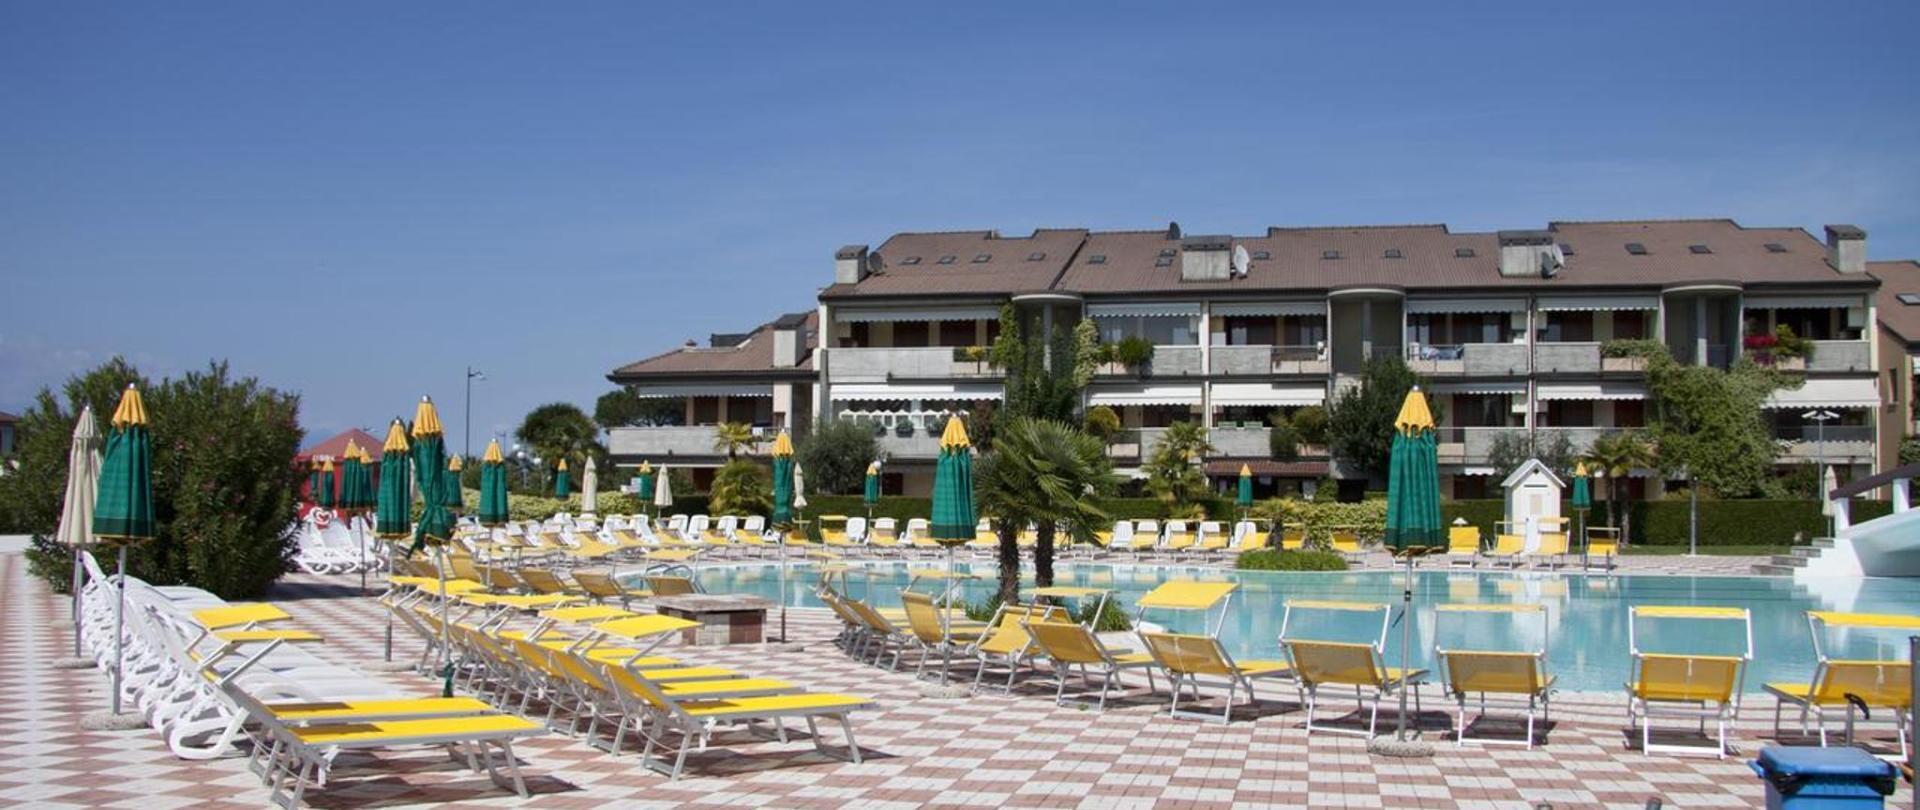 Via Durighello Desenzano Del Garda lauri & faggi official site | aparthotels in desenzano del garda